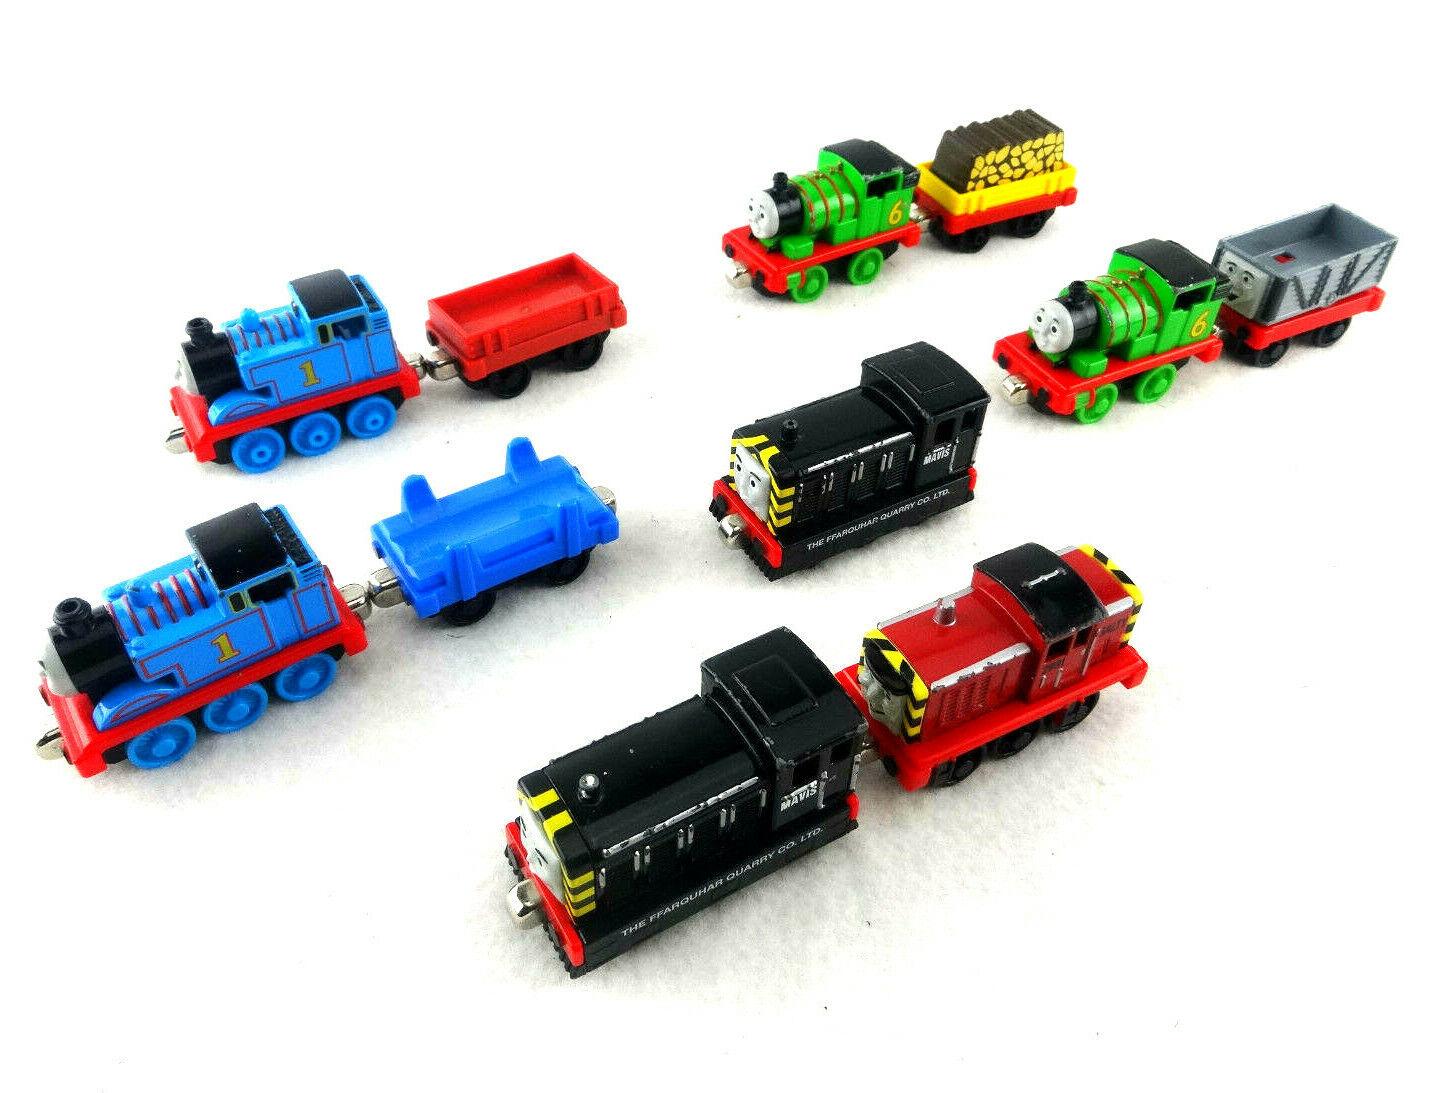 Thomas the Train, Percy, Mavis, Salty, Train bils Förfägda VGC fri Shipping